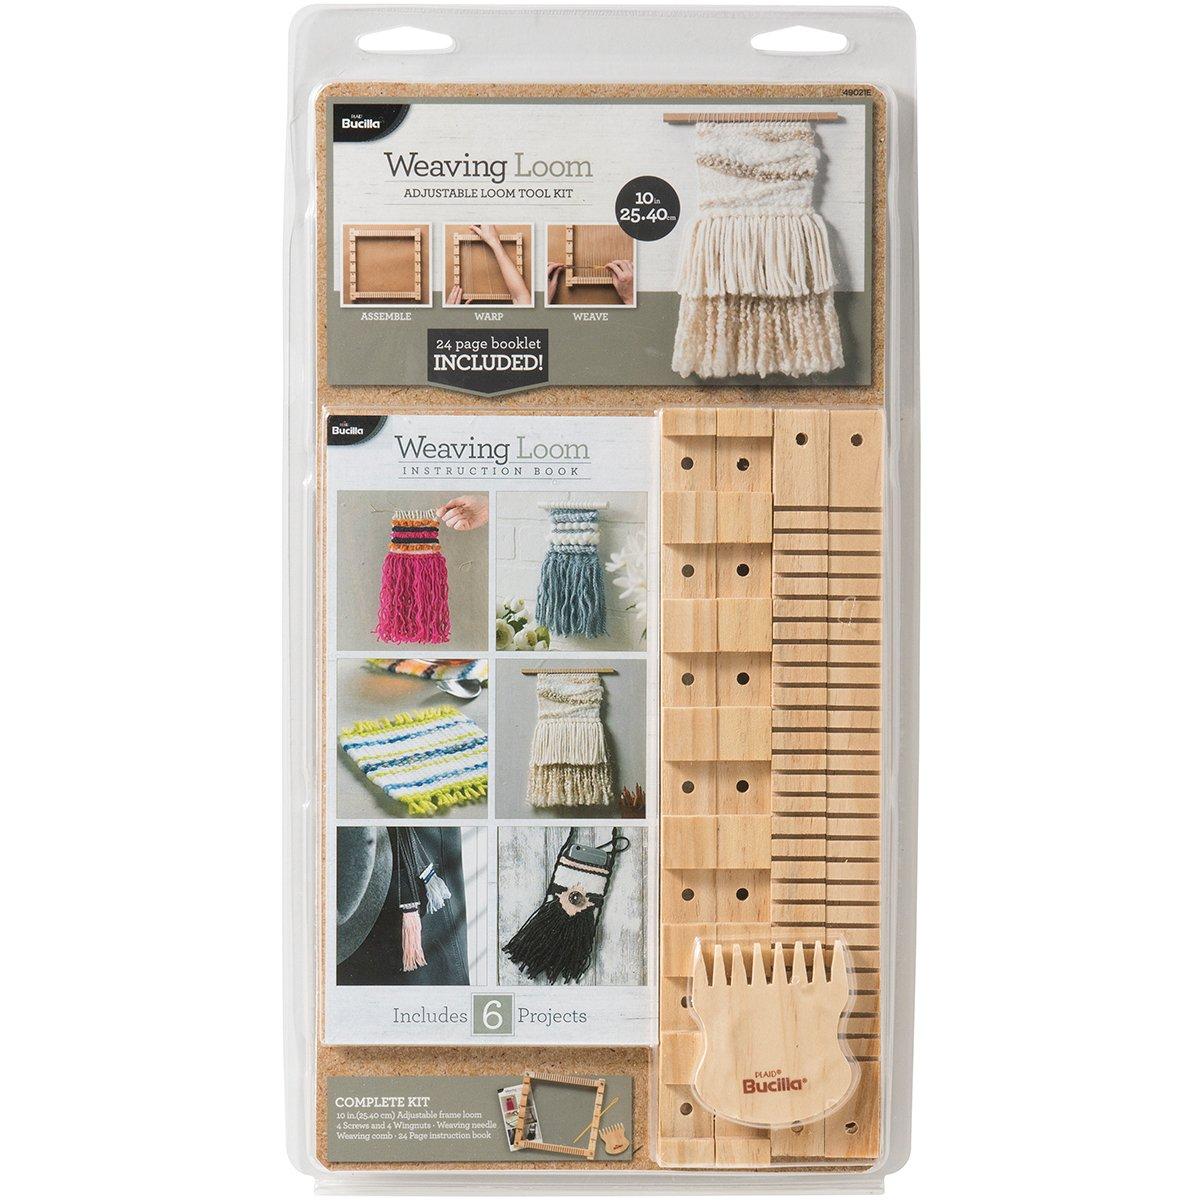 Bucilla 49021E 10 Inch Tool Weaving Loom